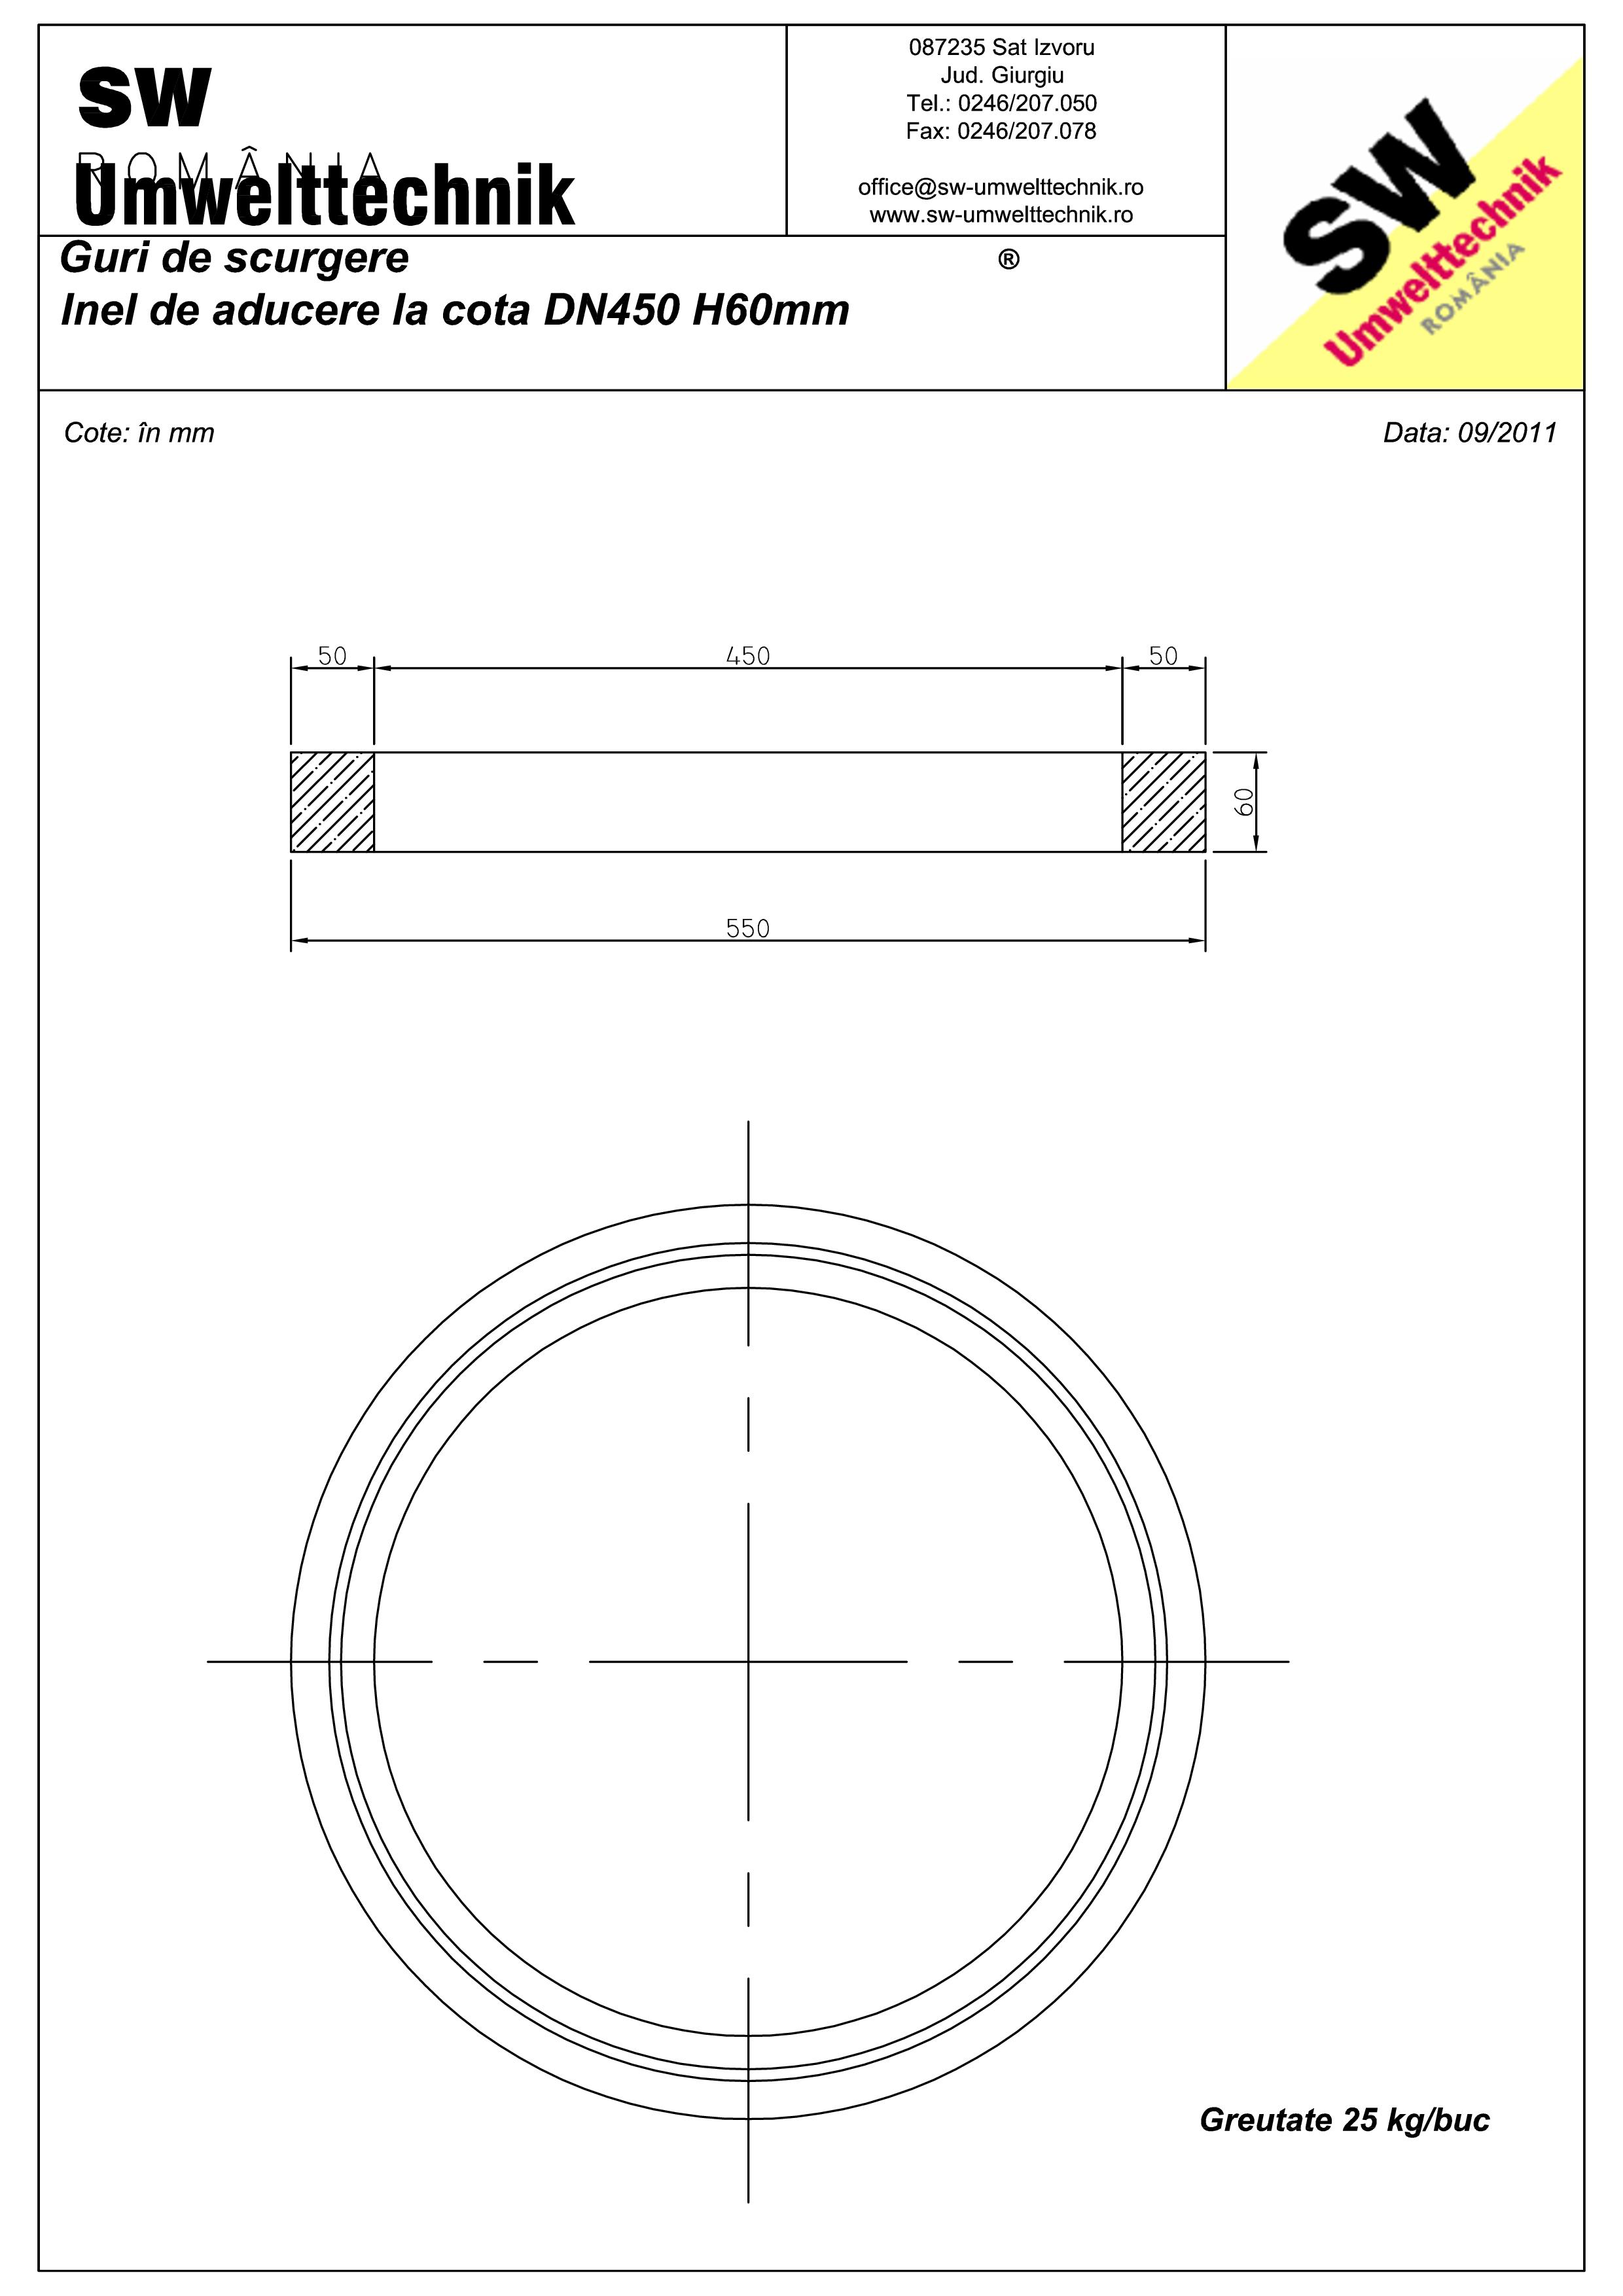 Pagina 1 - CAD-PDF Plan Austria - inel de aducere la cota DN450 H60 mm SW UMWELTTECHNIK Detaliu de...